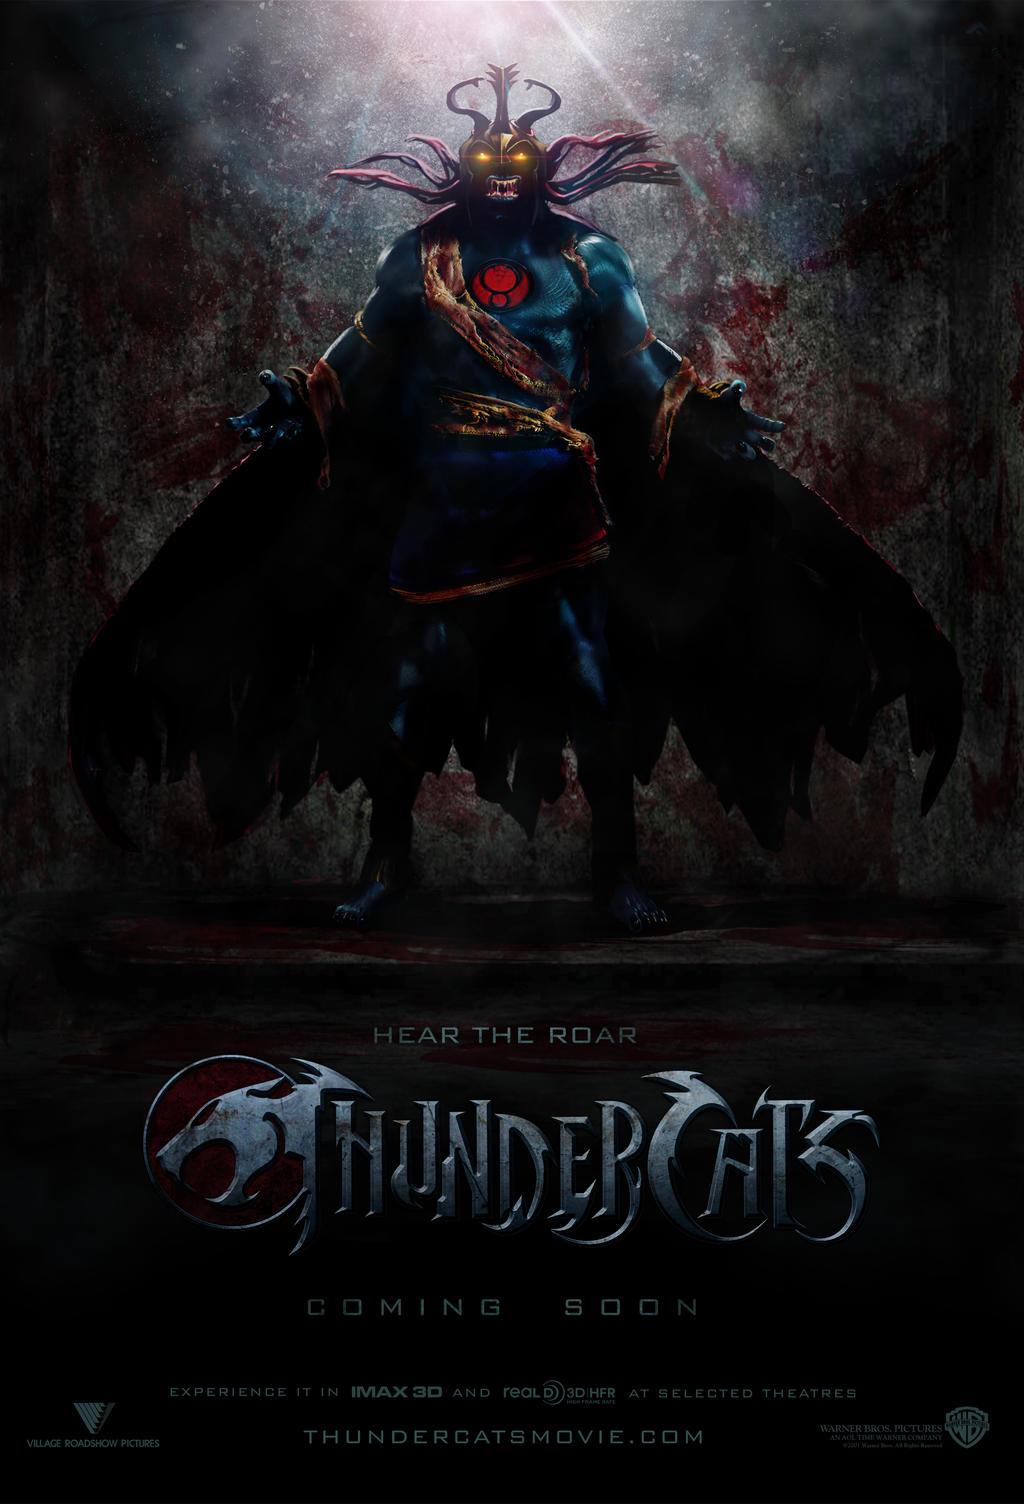 thundercats theatrical teaser poster by sdmdigital on